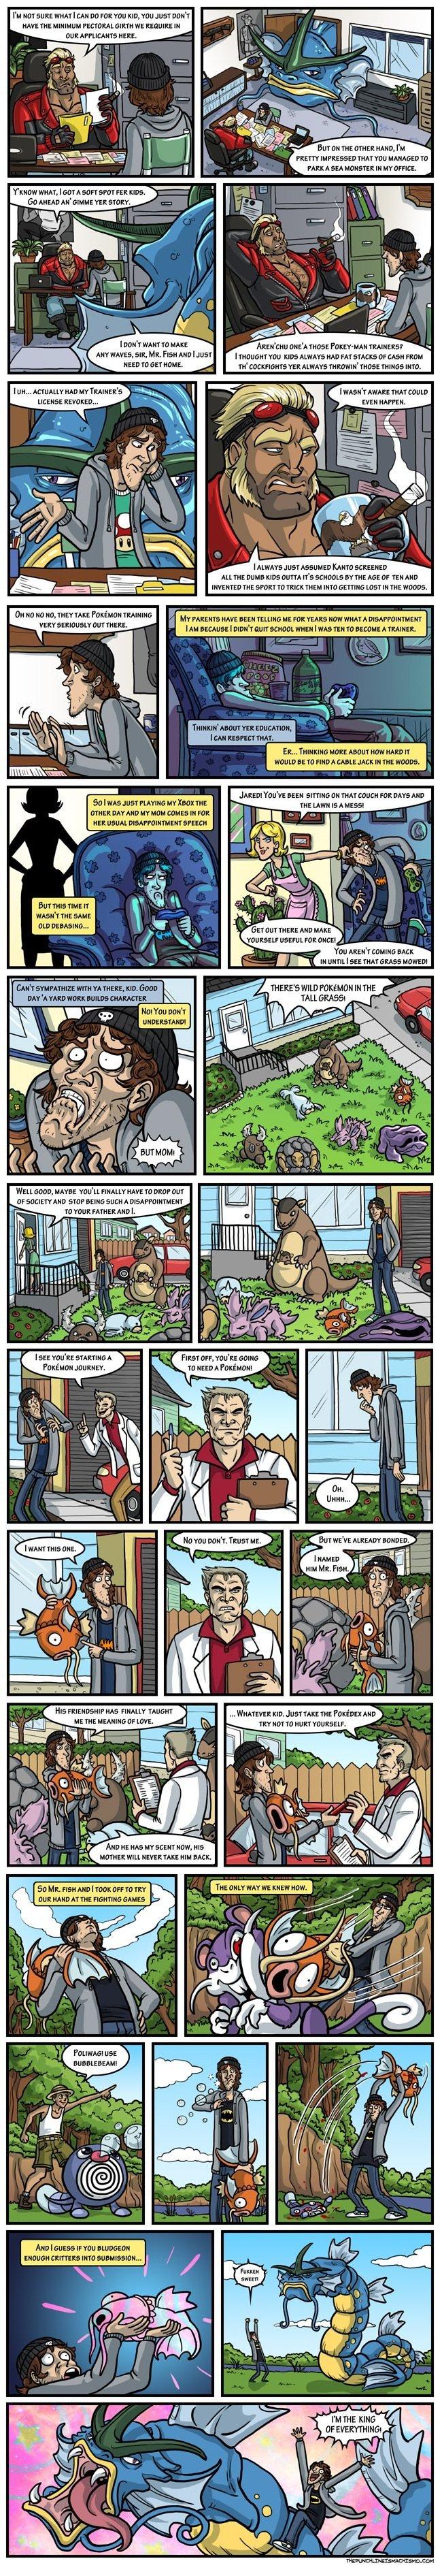 pokeymans. probably a repost.. Repost, but it's funny still. Pokemon funny